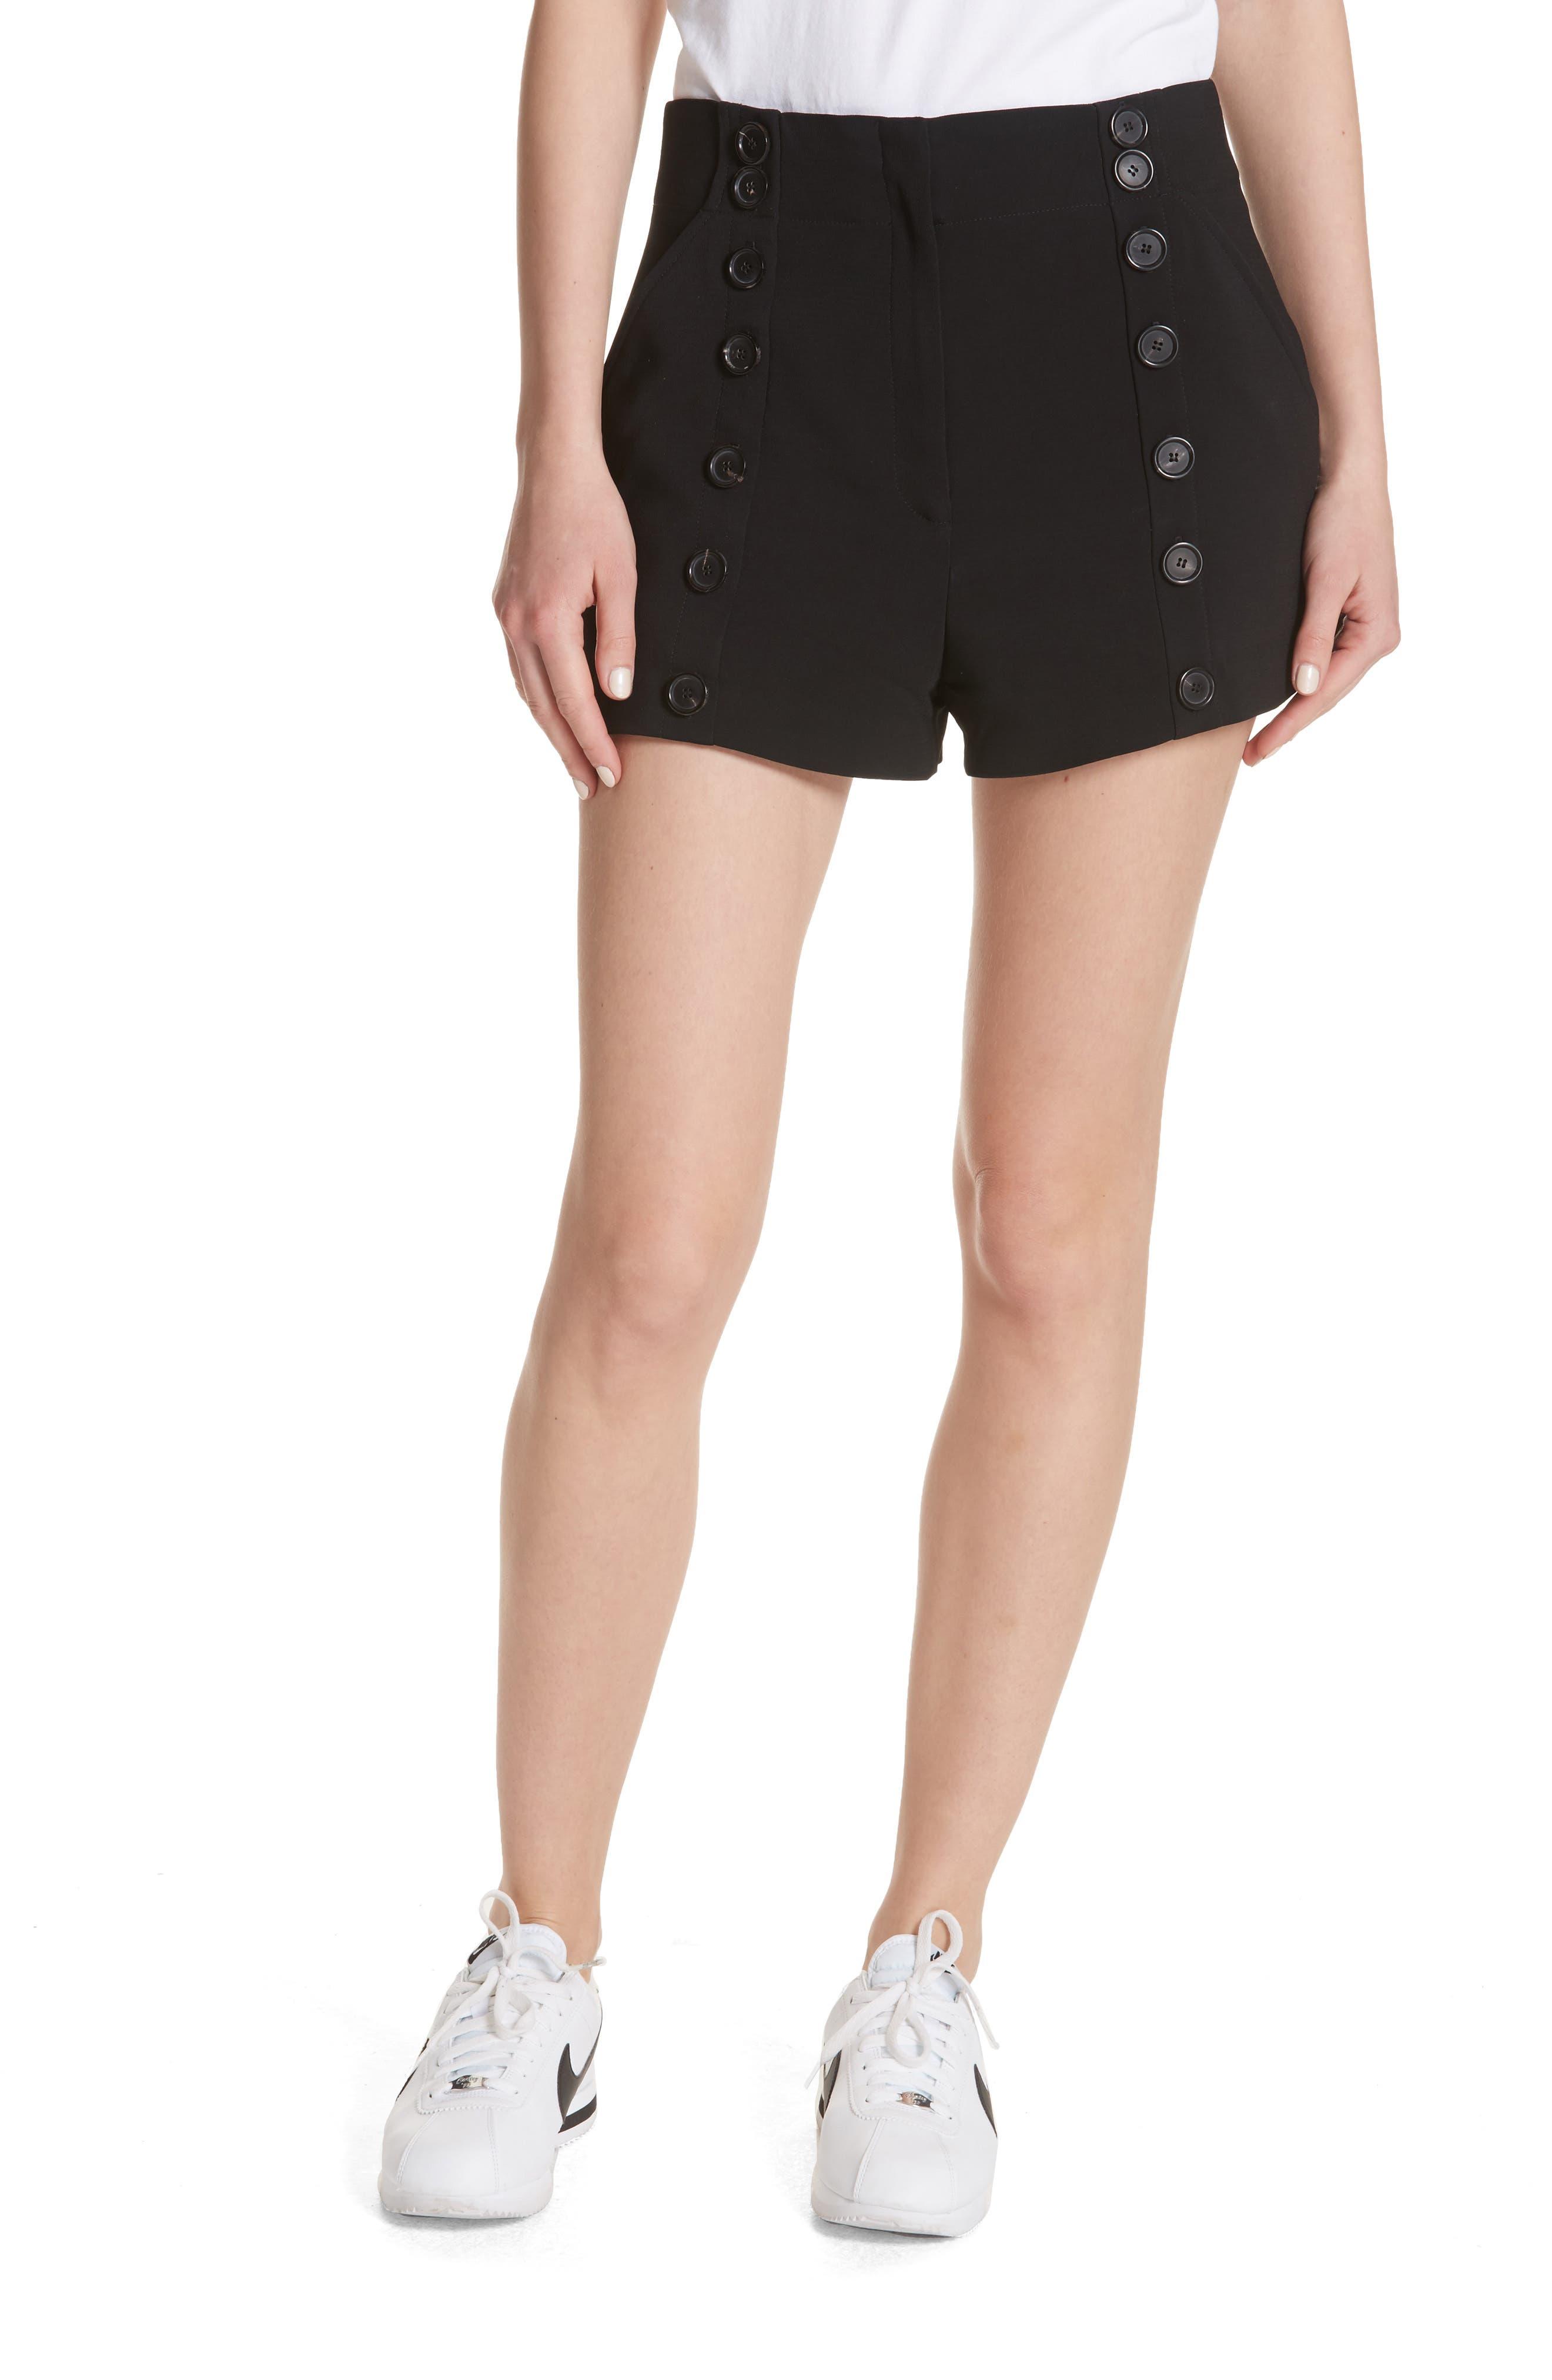 A.L.C. Issac Shorts